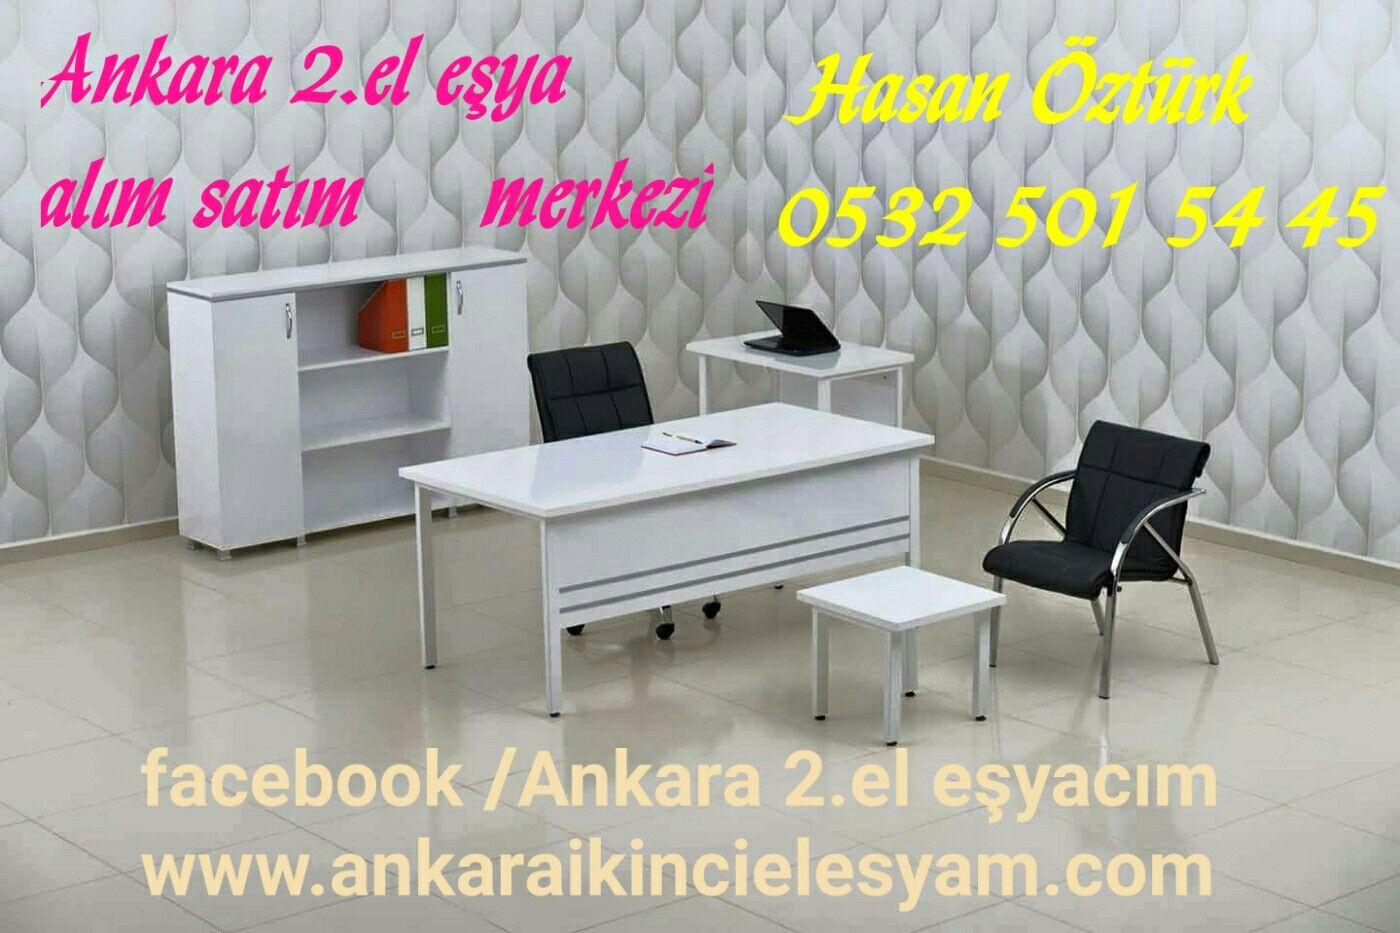 Ozturk Ofis Mobilyalari Adli Kullanicinin Ankara Da 2 El Esya Alim Satim Merkezi Hasan Ozturk 0532 501 54 45 Panosundaki Pin